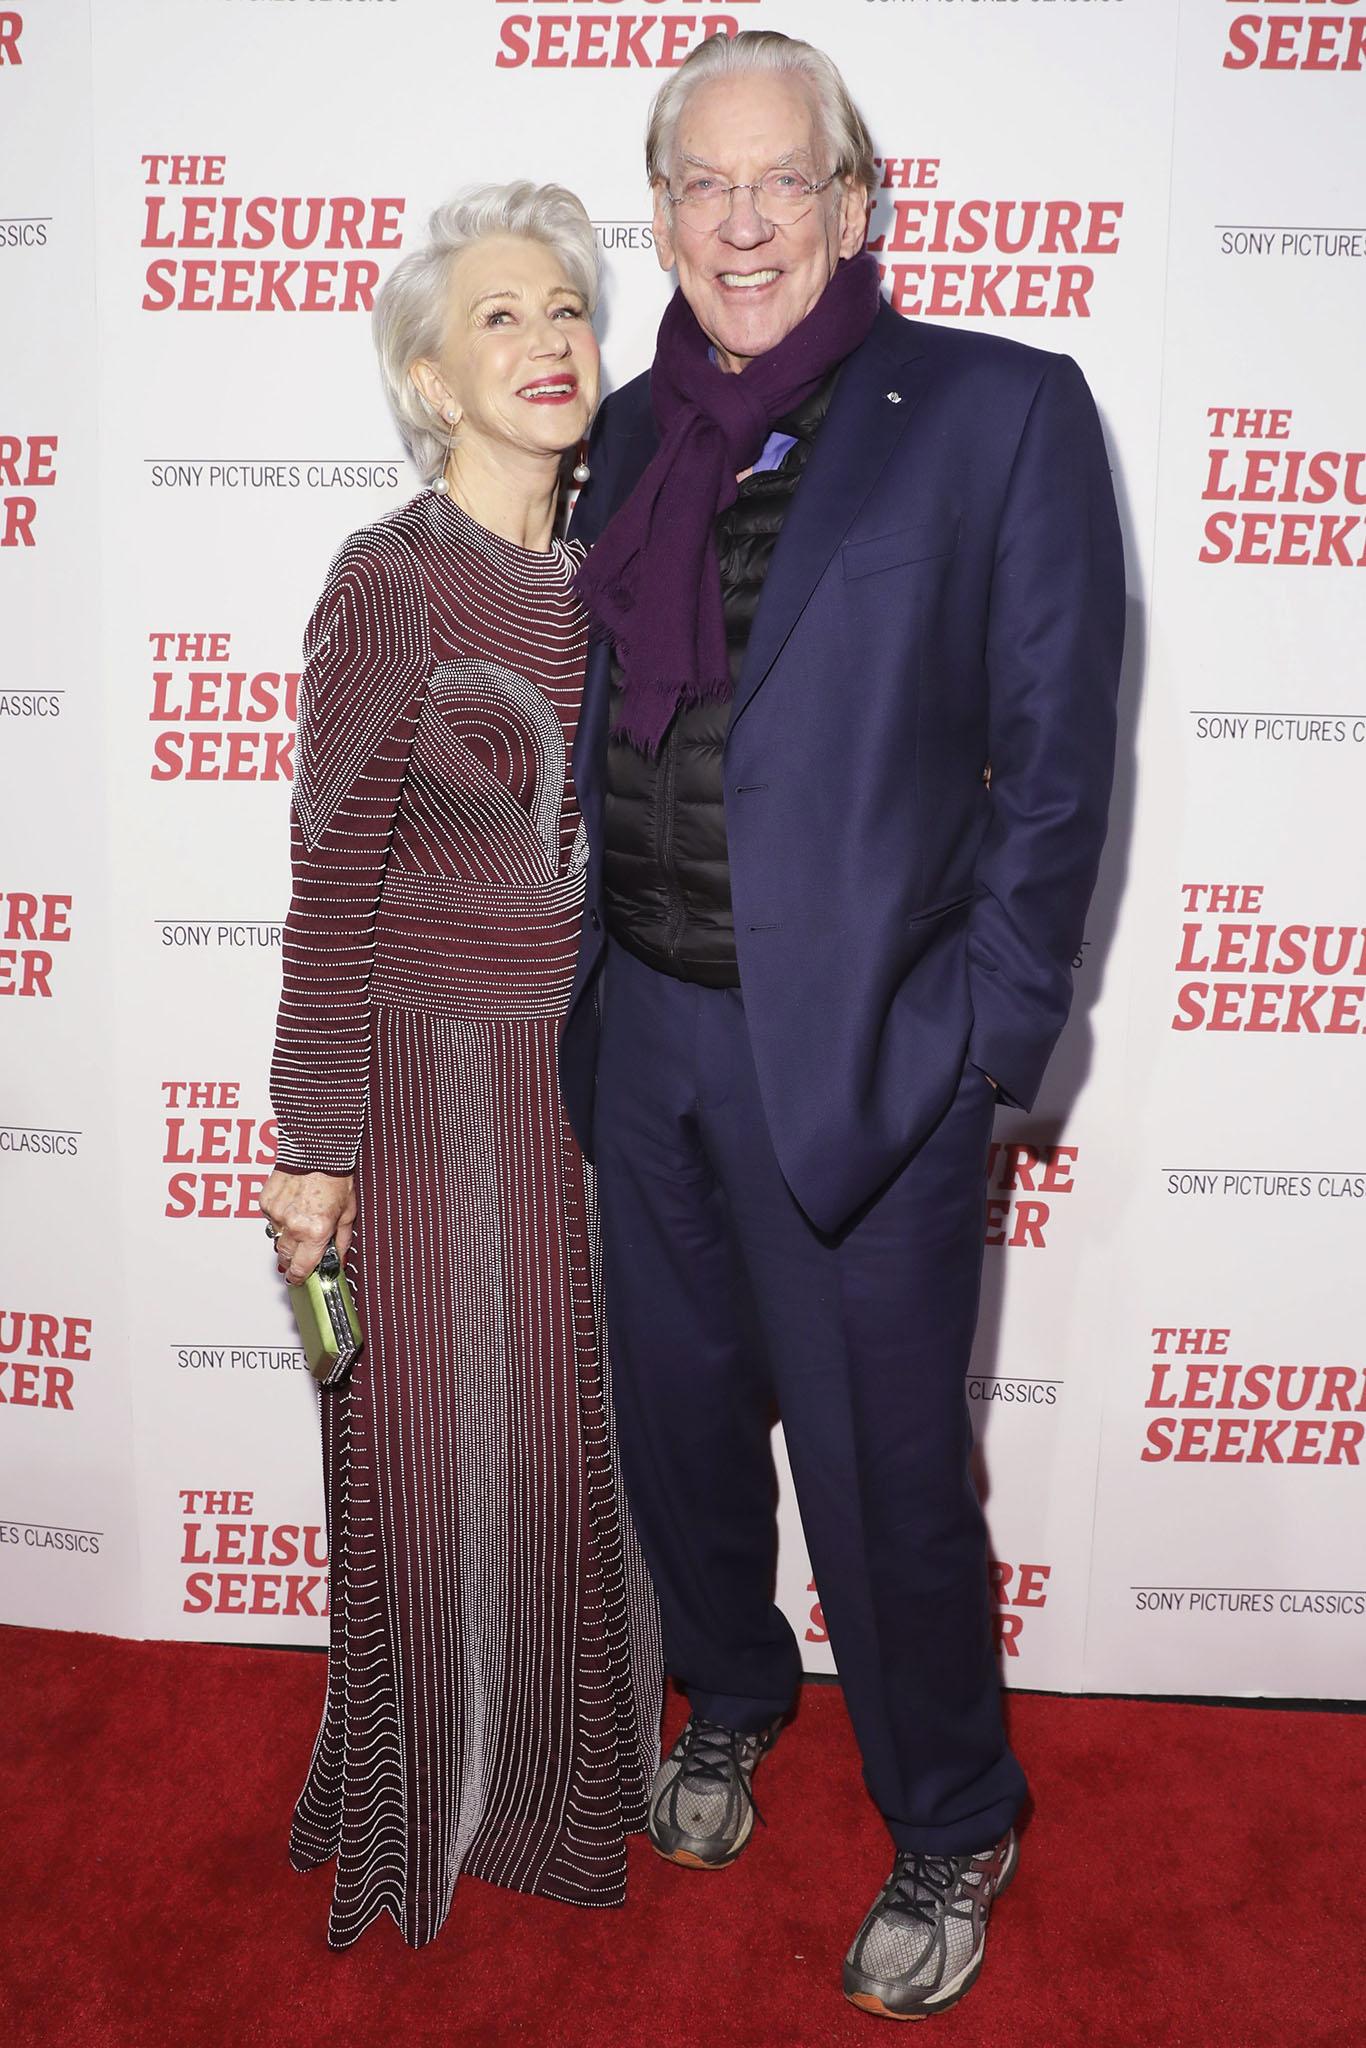 Helen Mirren and Donald Sutherland'The Leisure Seeker' film screening, Arrivals, New York, USA - 11 Jan 2018